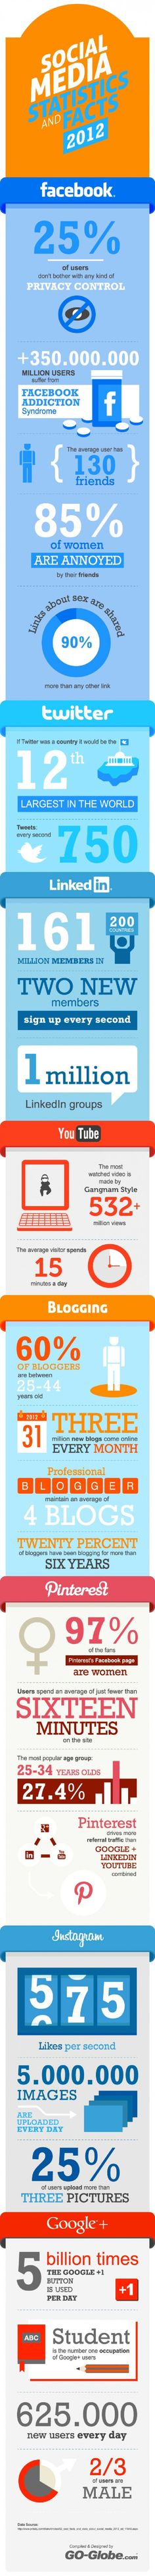 Social Media Statistiken zu Facebook, Google+, Pinterest, Twitter & Co.